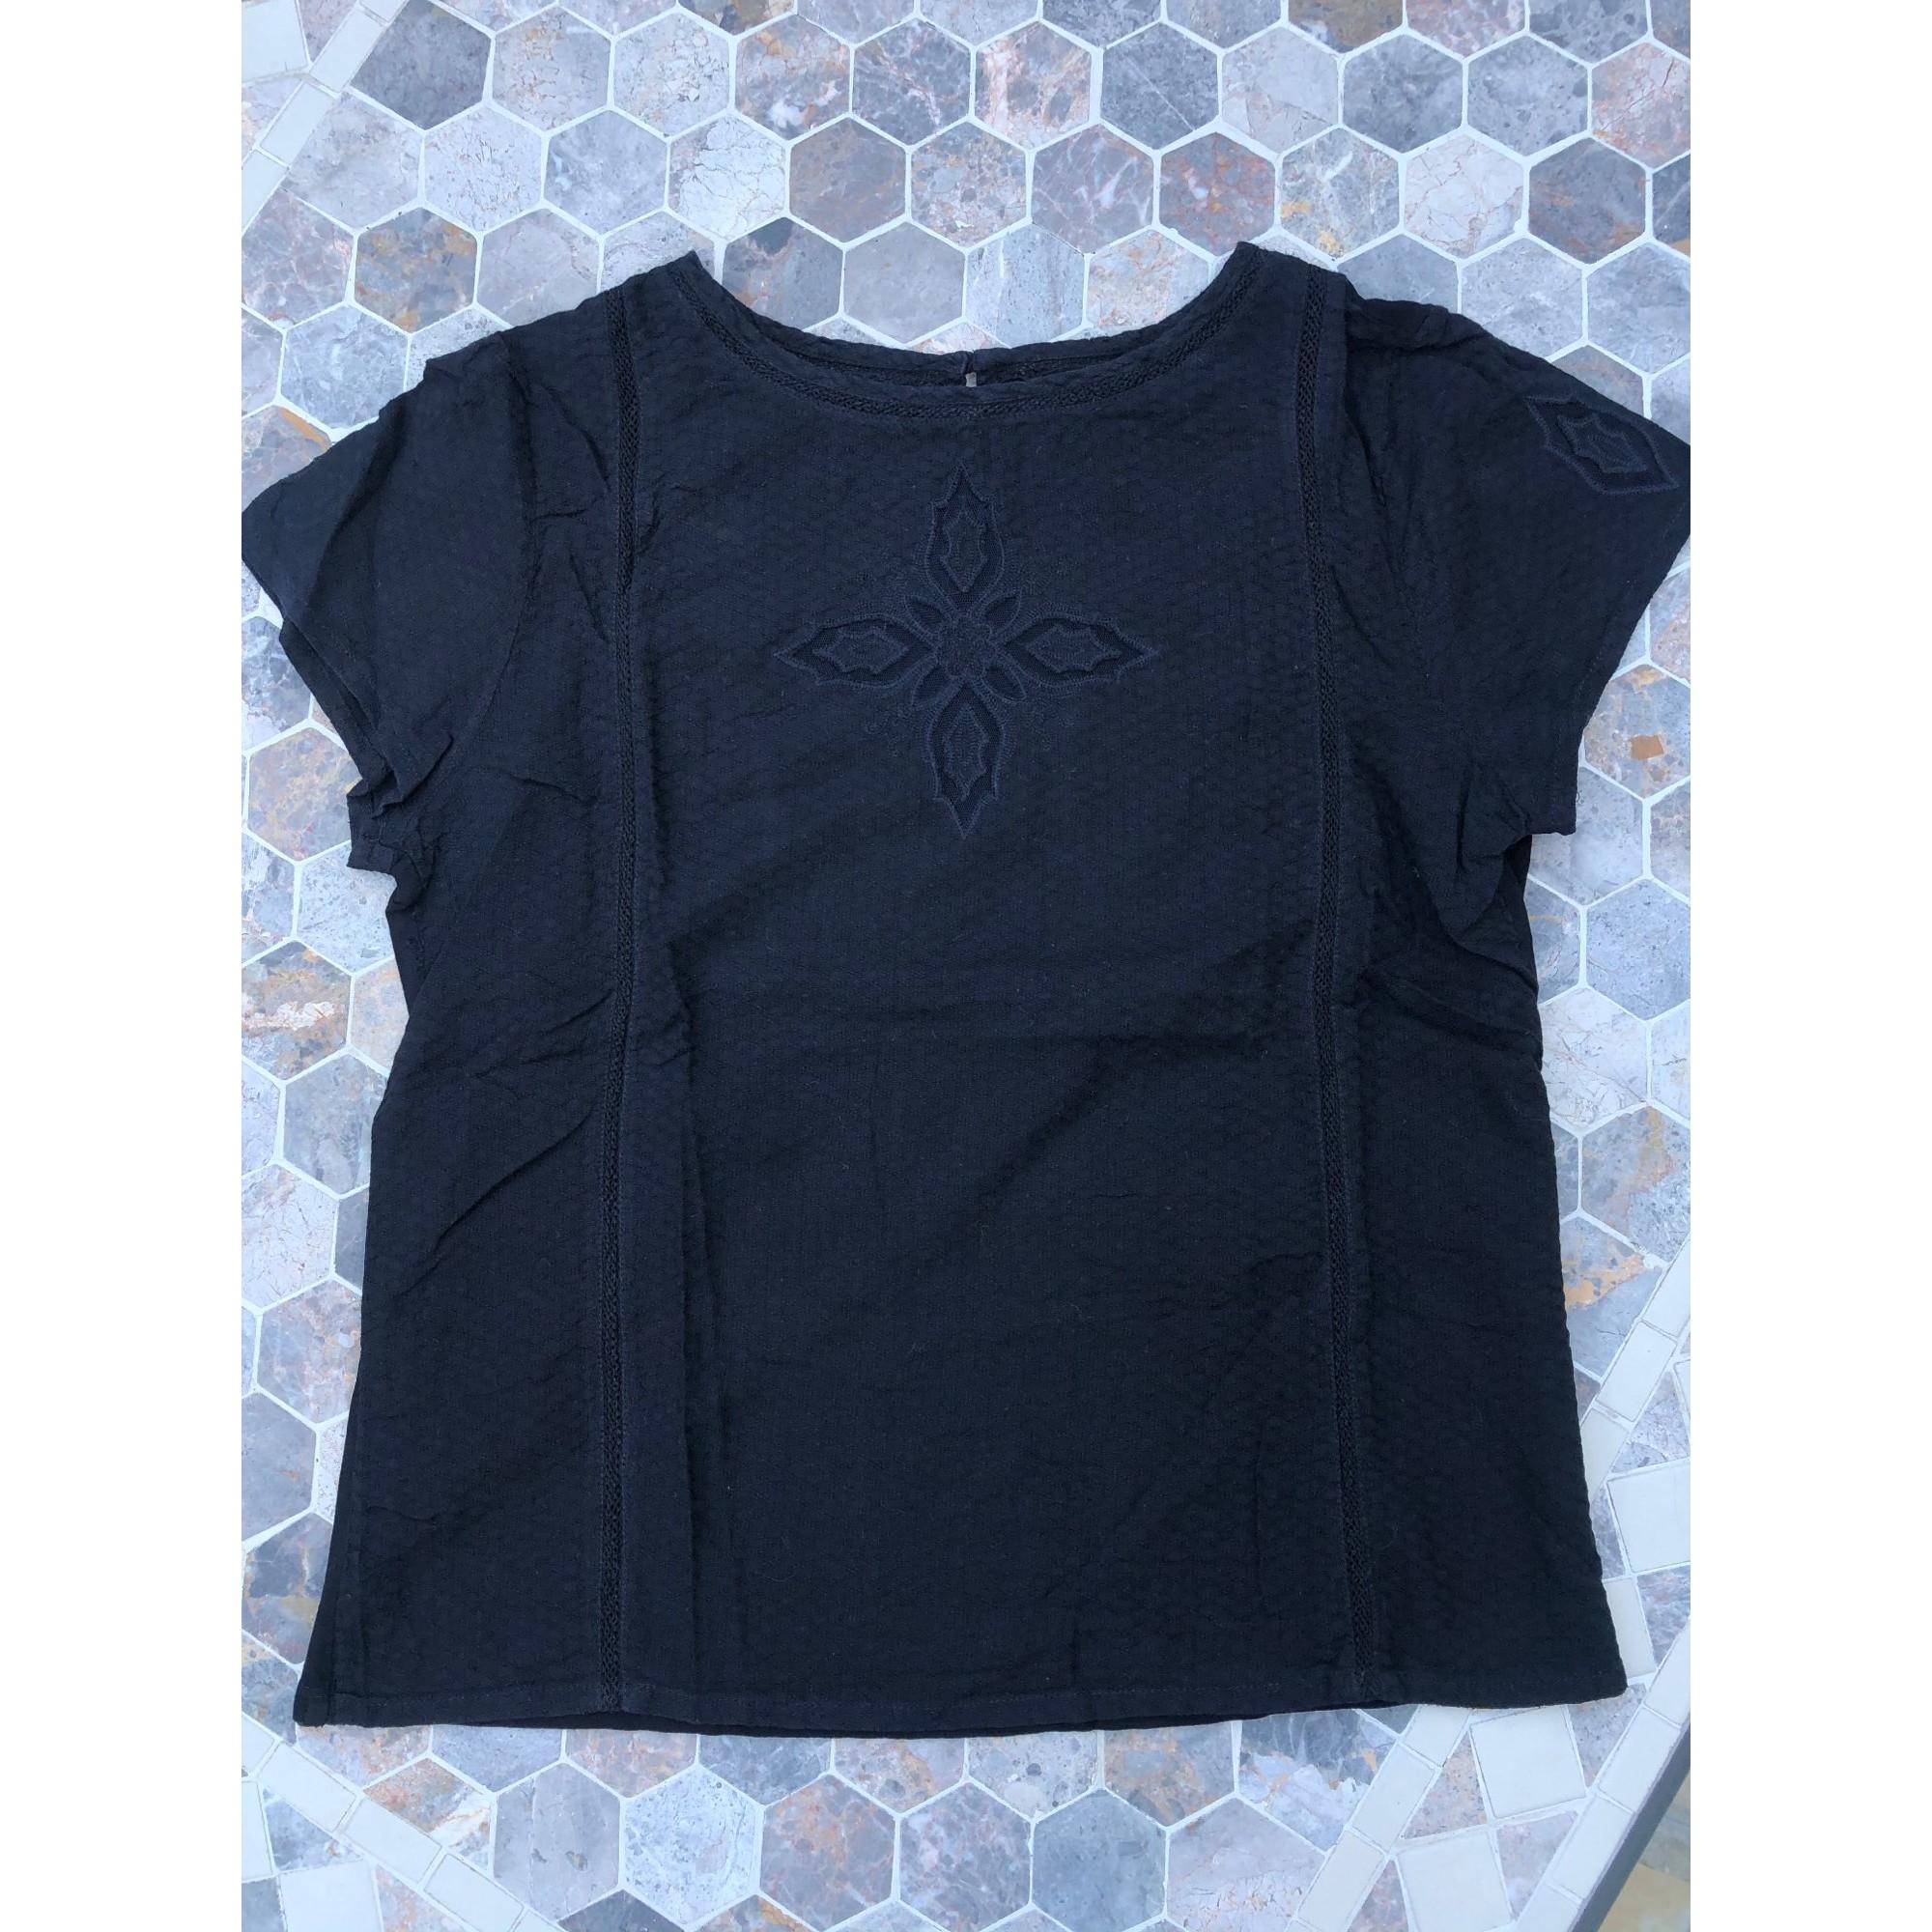 Top, tee-shirt BERENICE Noir